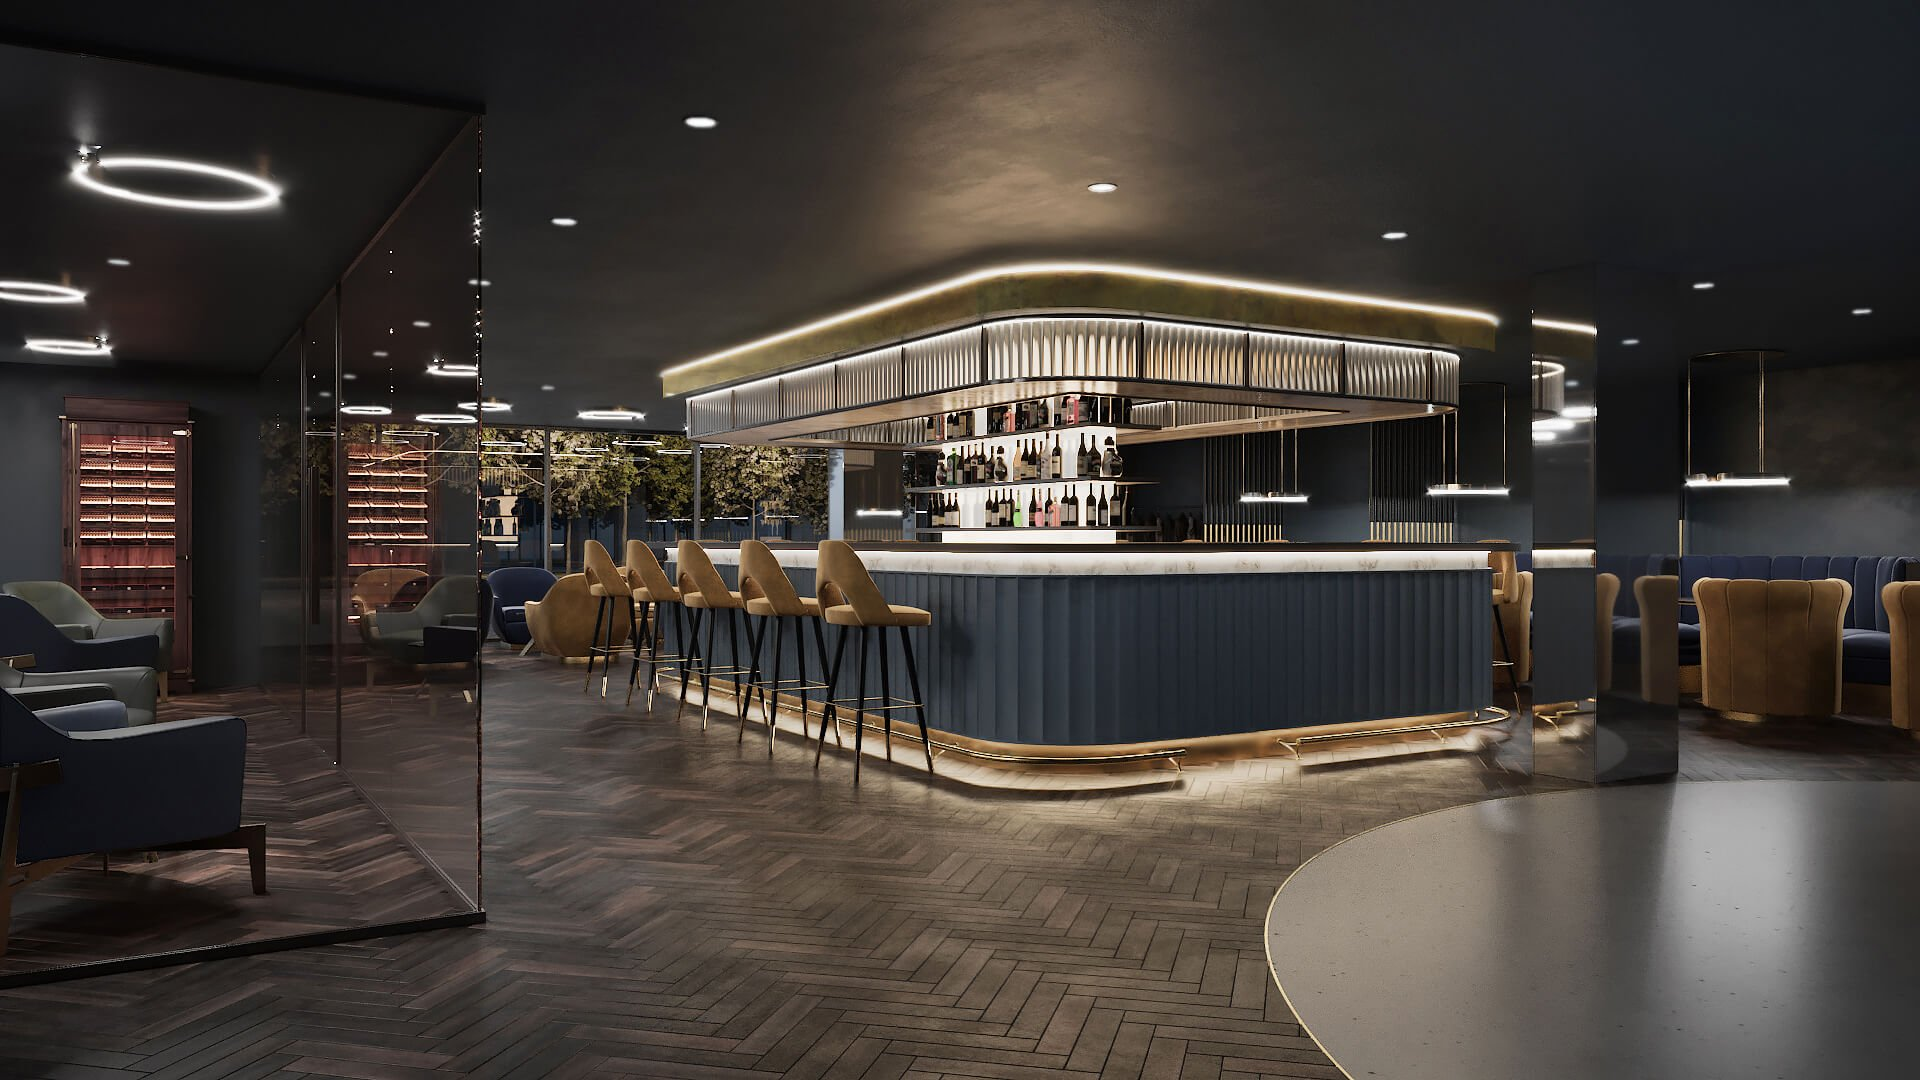 3D Rendering of a Spacious Restaurant Interior